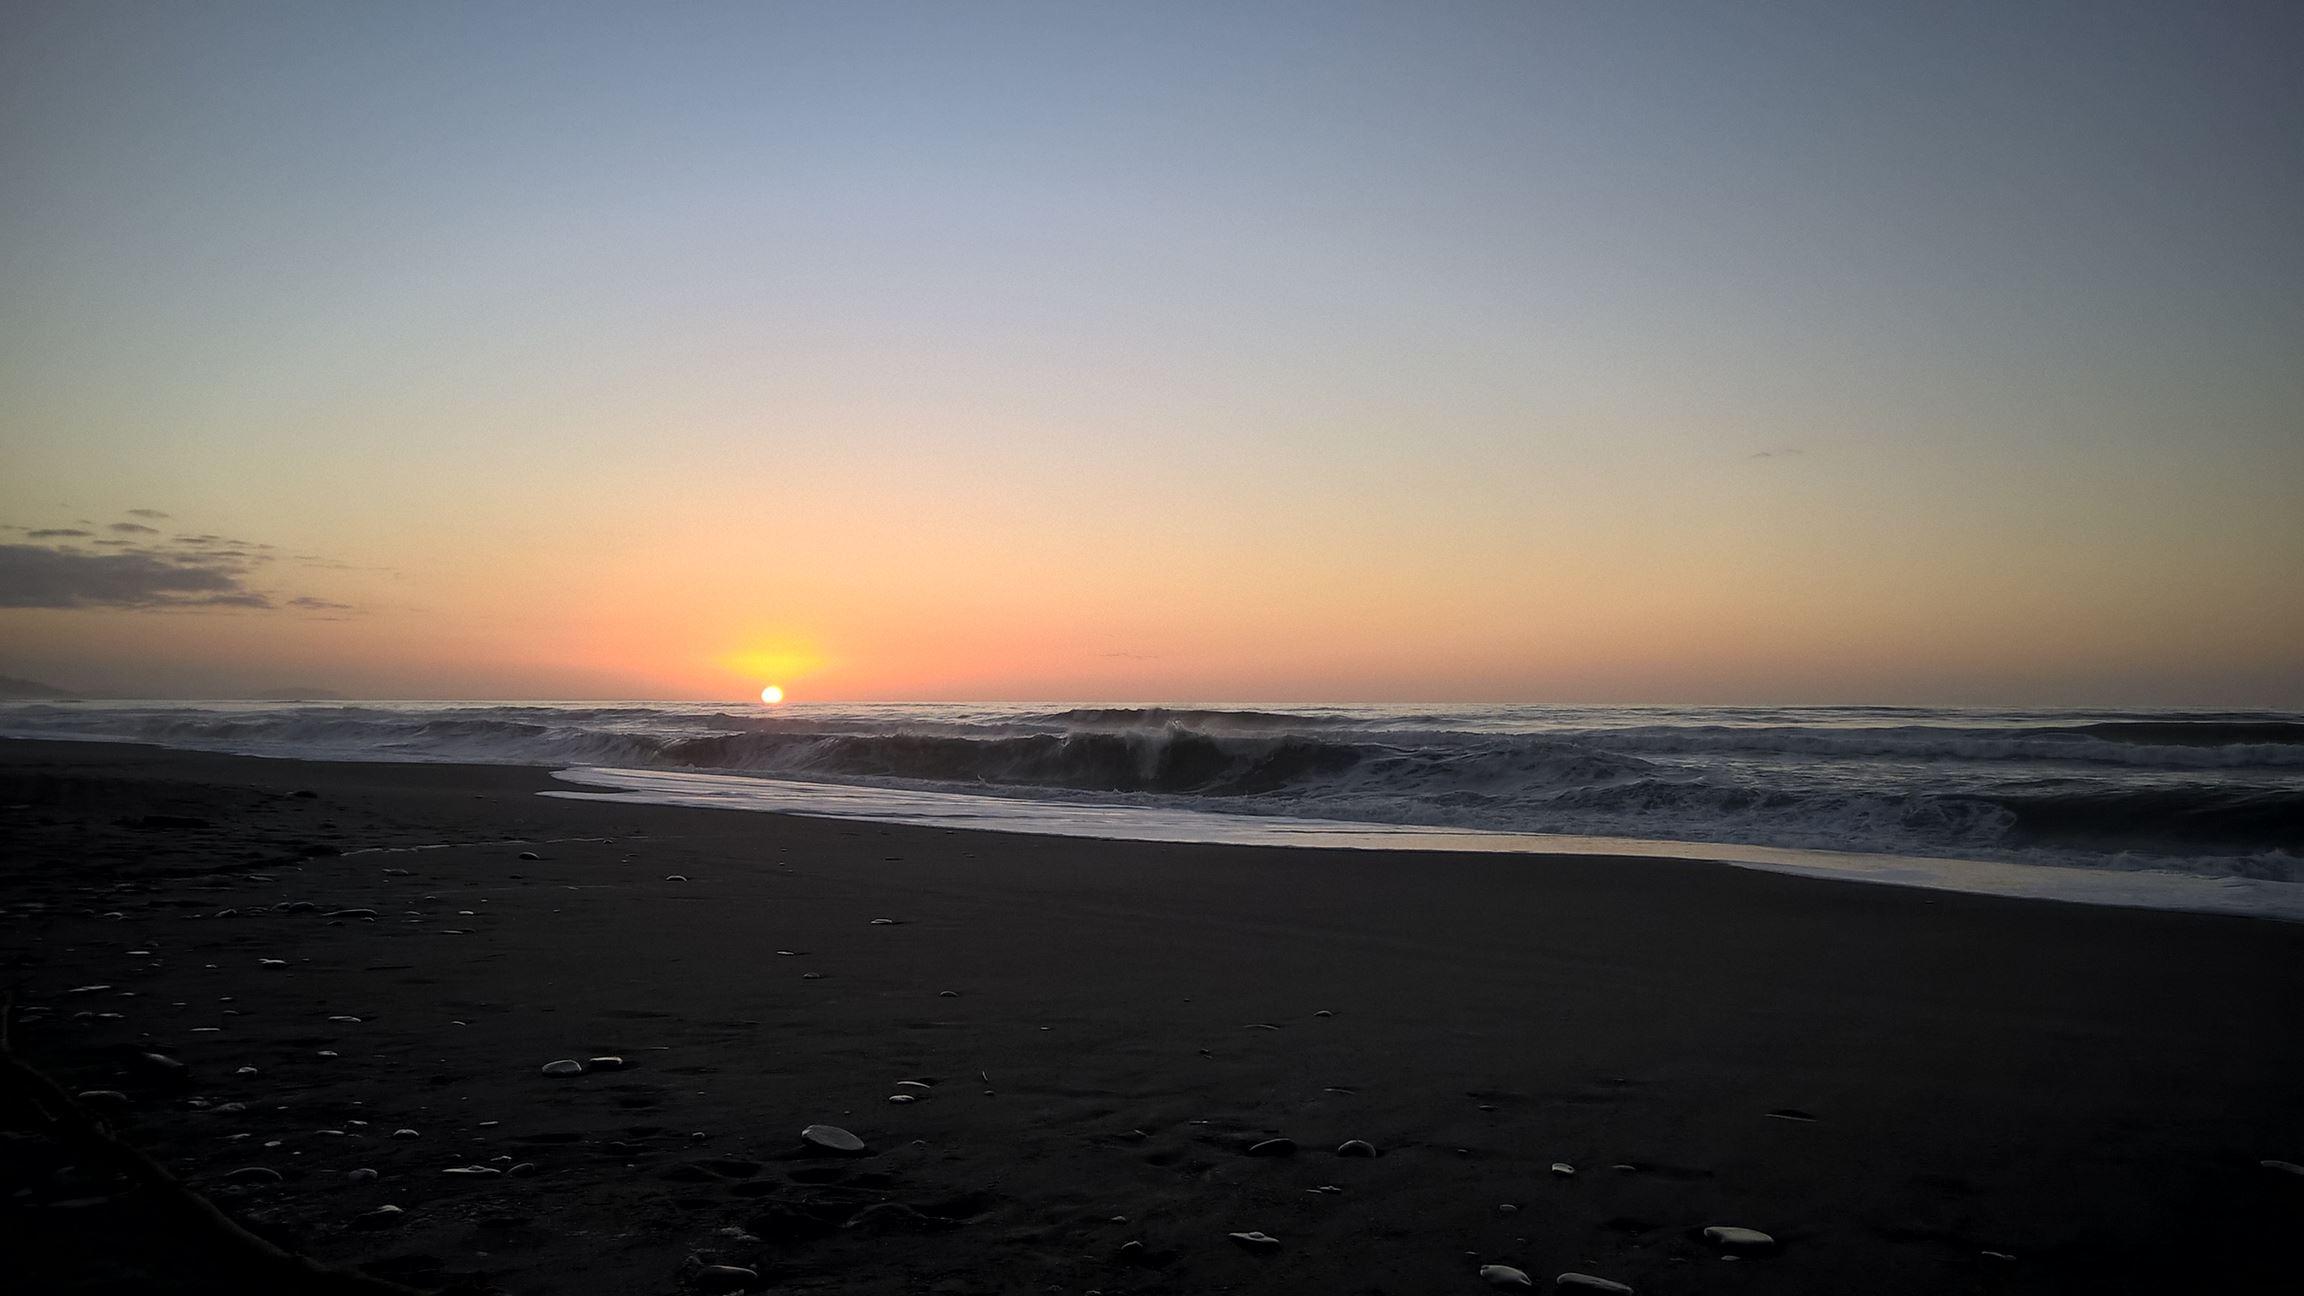 Der klarste Sonnenuntergang bisher